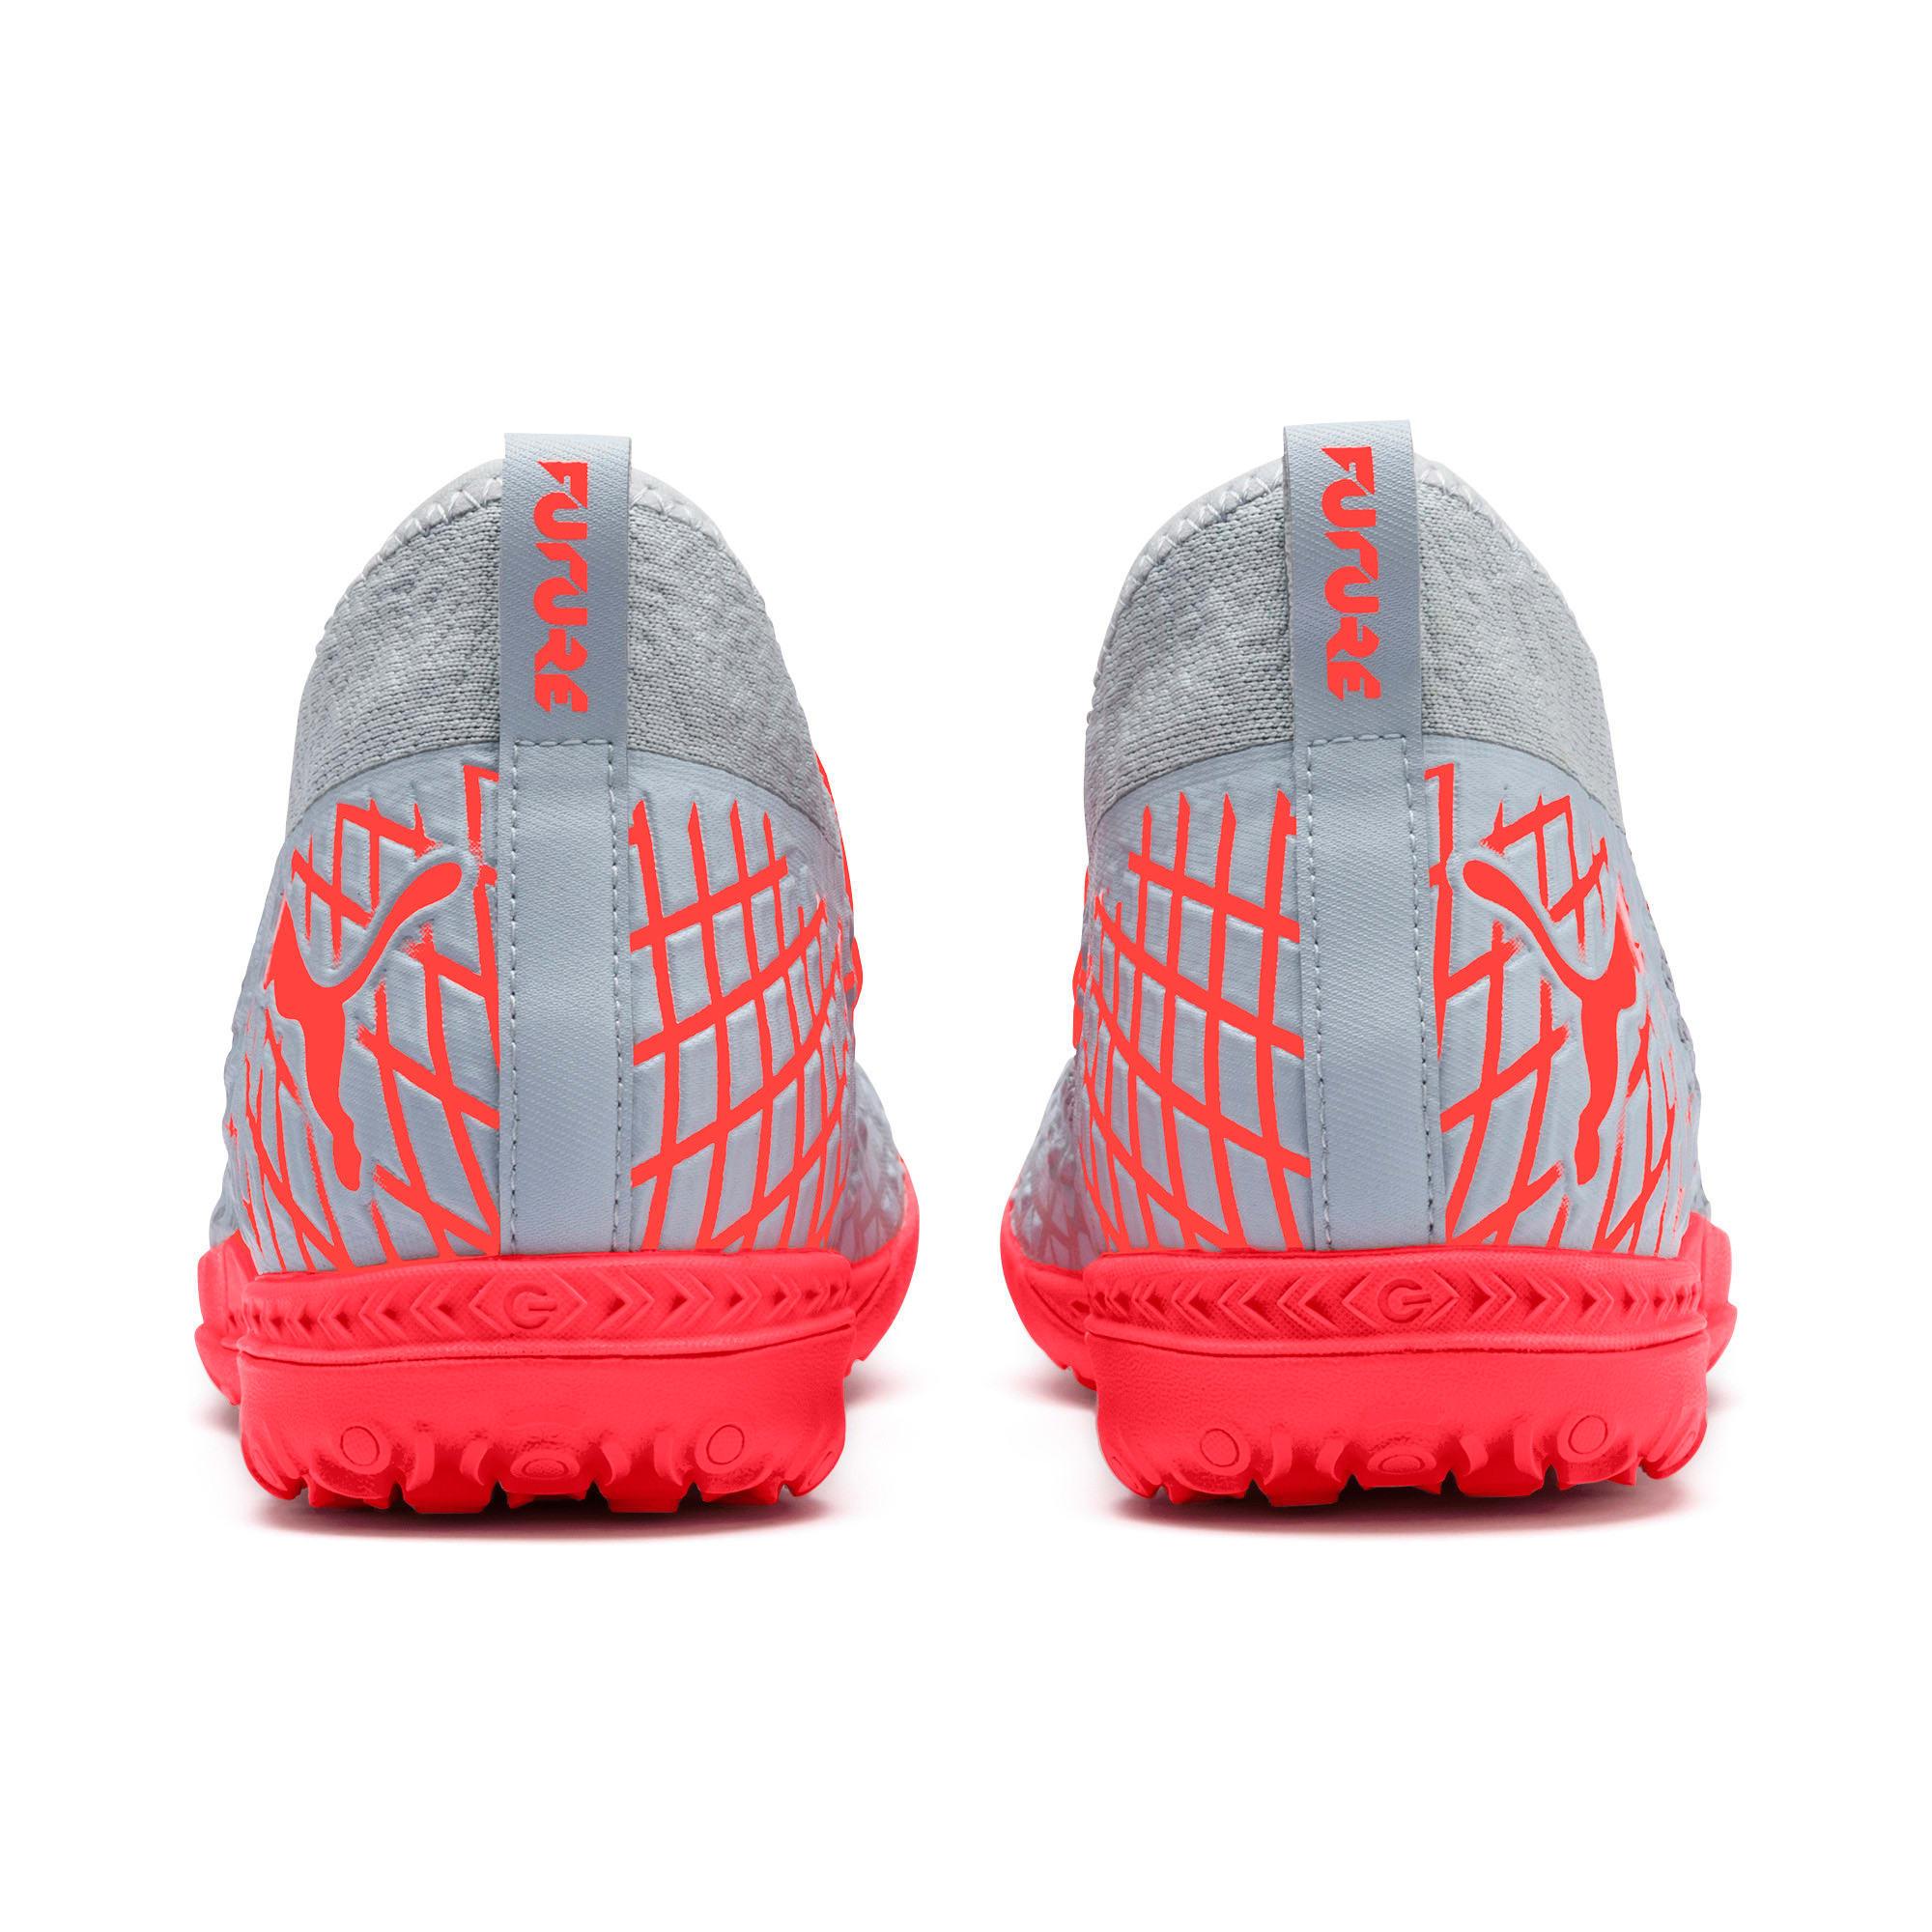 Thumbnail 4 of FUTURE 4.3 NETFIT TT Men's Soccer Shoes, Glacial Blue-Nrgy Red, medium